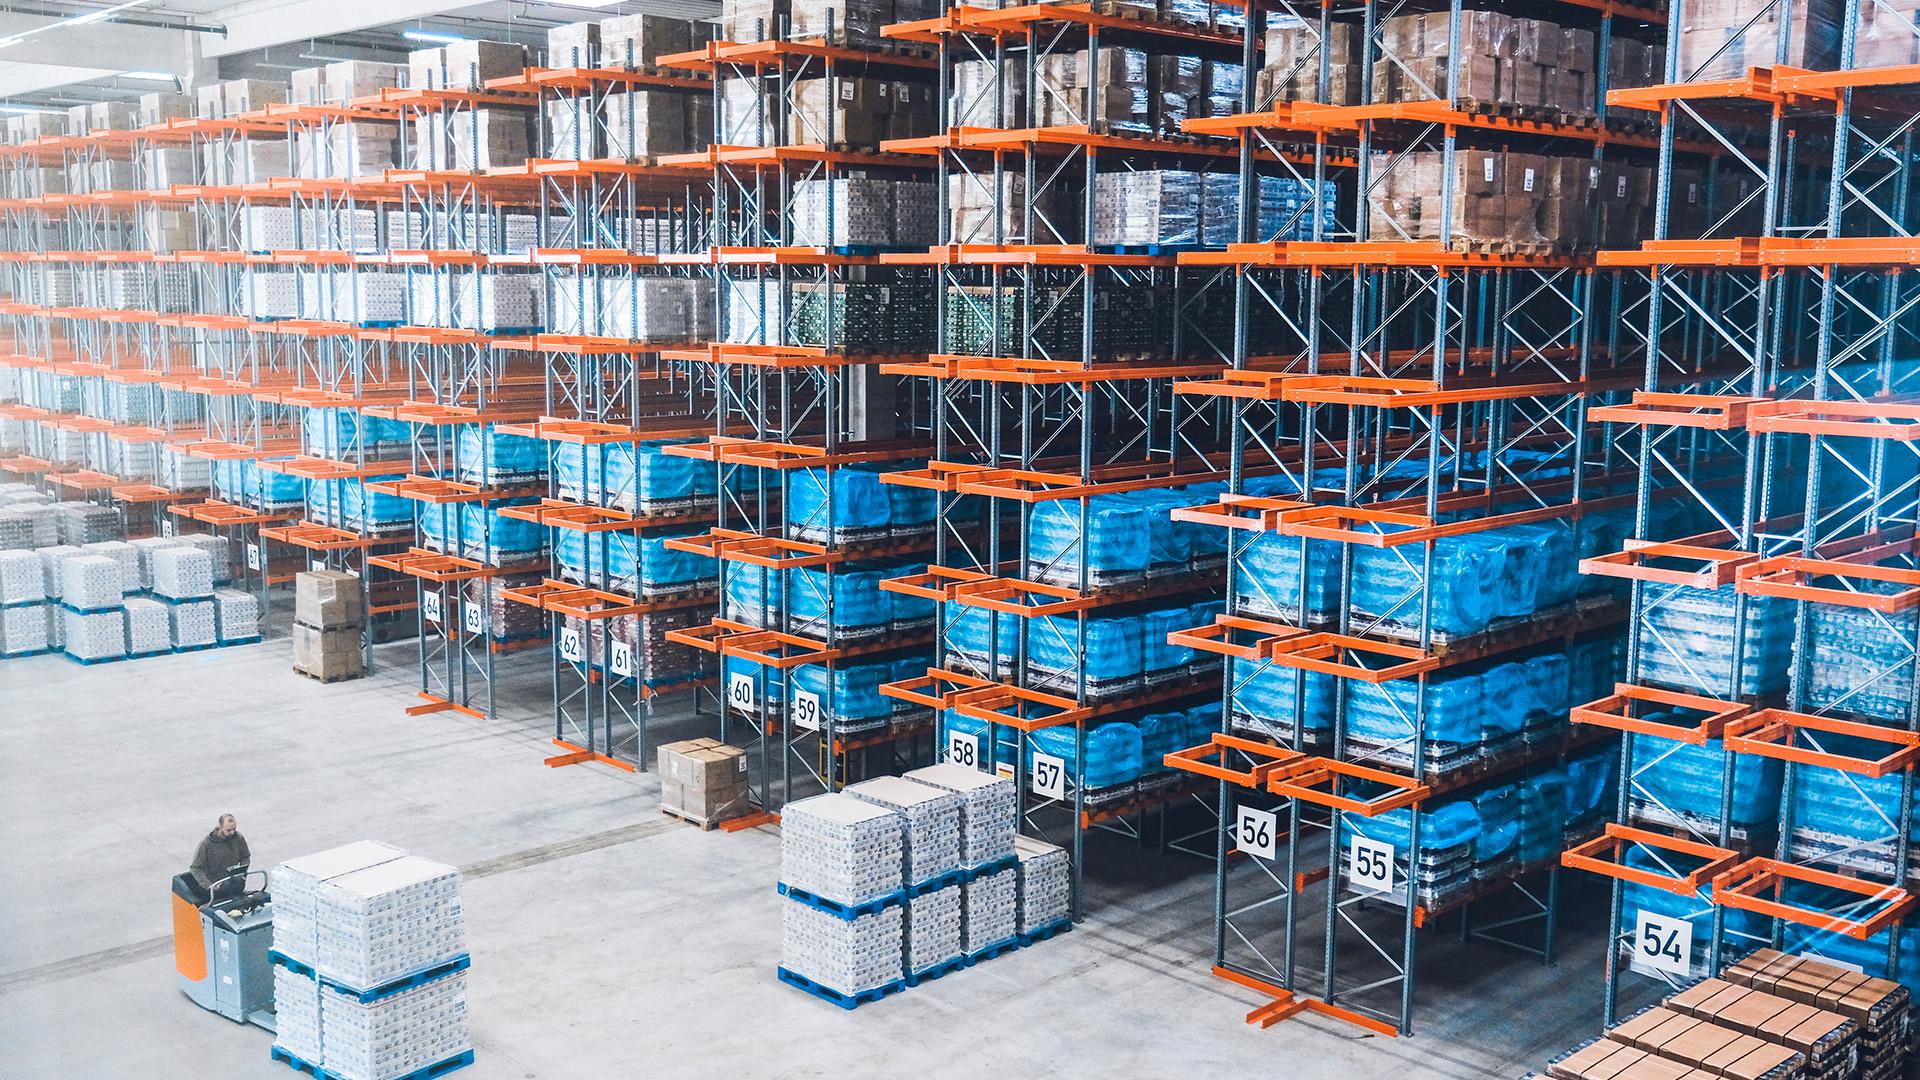 Stenkamp Logistik Borken Duisburg Lebensmittel Lagerung Lagerhalle Hochregallager Transport